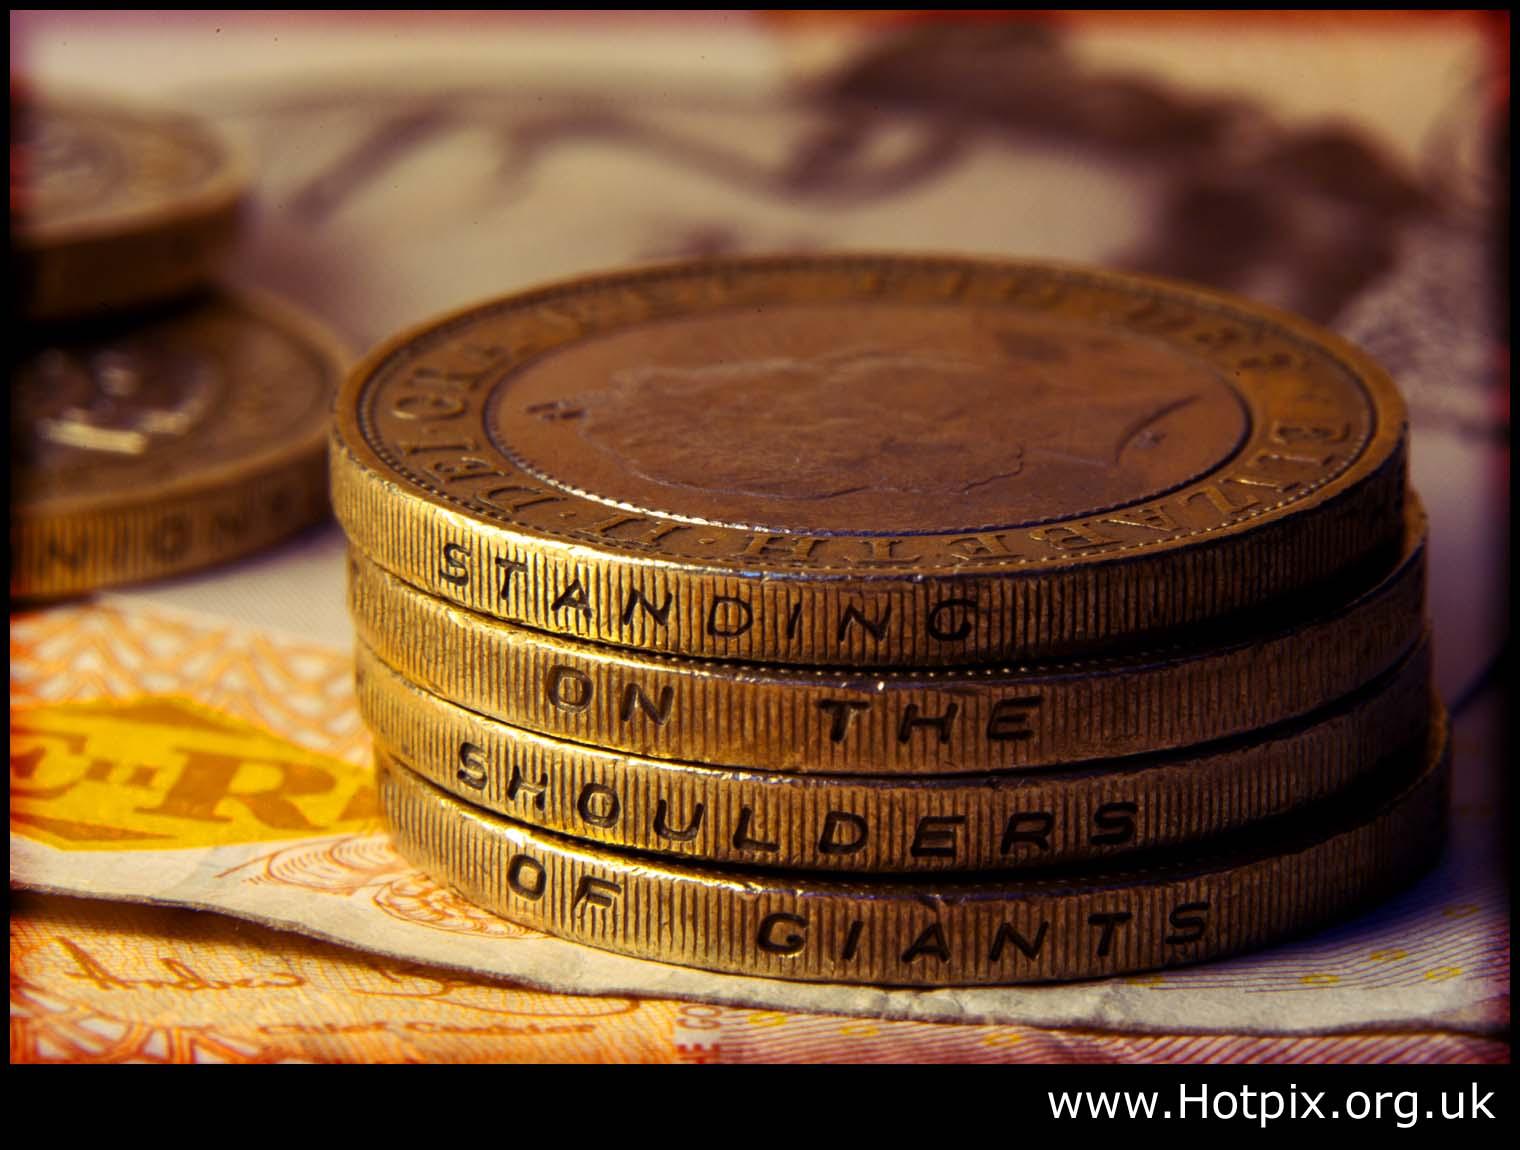 coin,coins,england,english,scotland,wales,welsh,scots,scottish,money,cash,edinbrugh,ipod,music,hotpix!,#tony,#smith,#tonysmith,#tonysmithhotpix,#tonysmithotpix